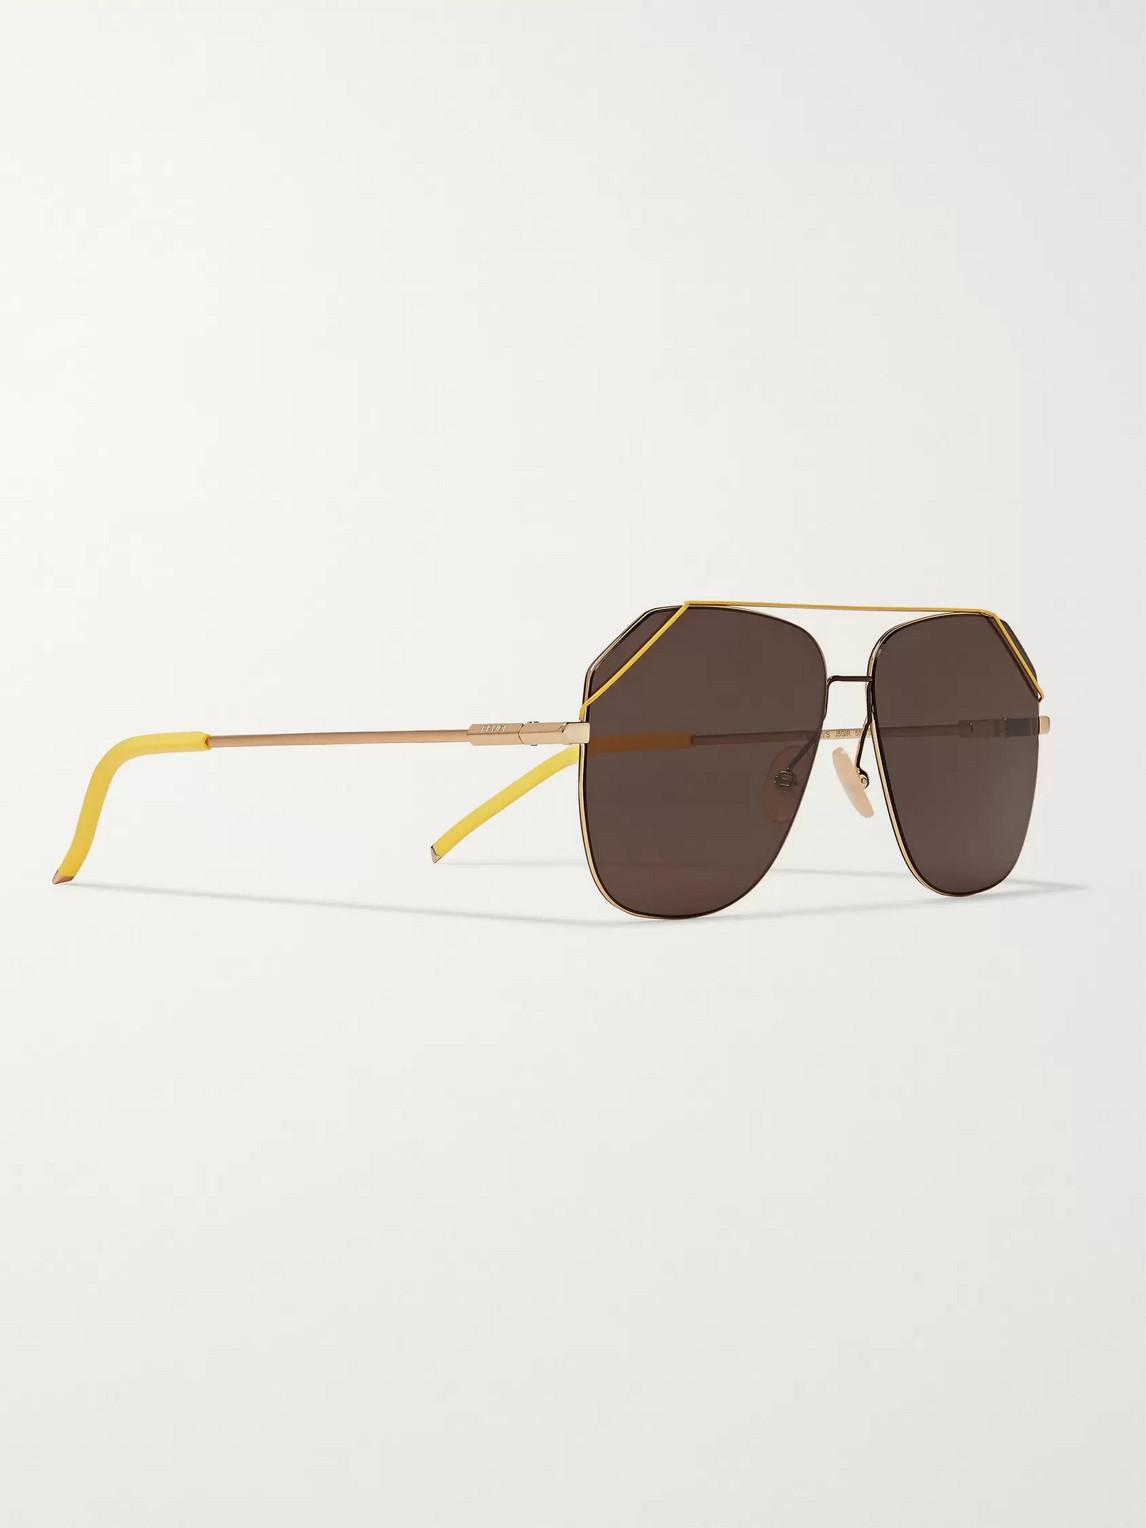 Fendi Sunglasses AVIATOR-STYLE GOLD-TONE SUNGLASSES